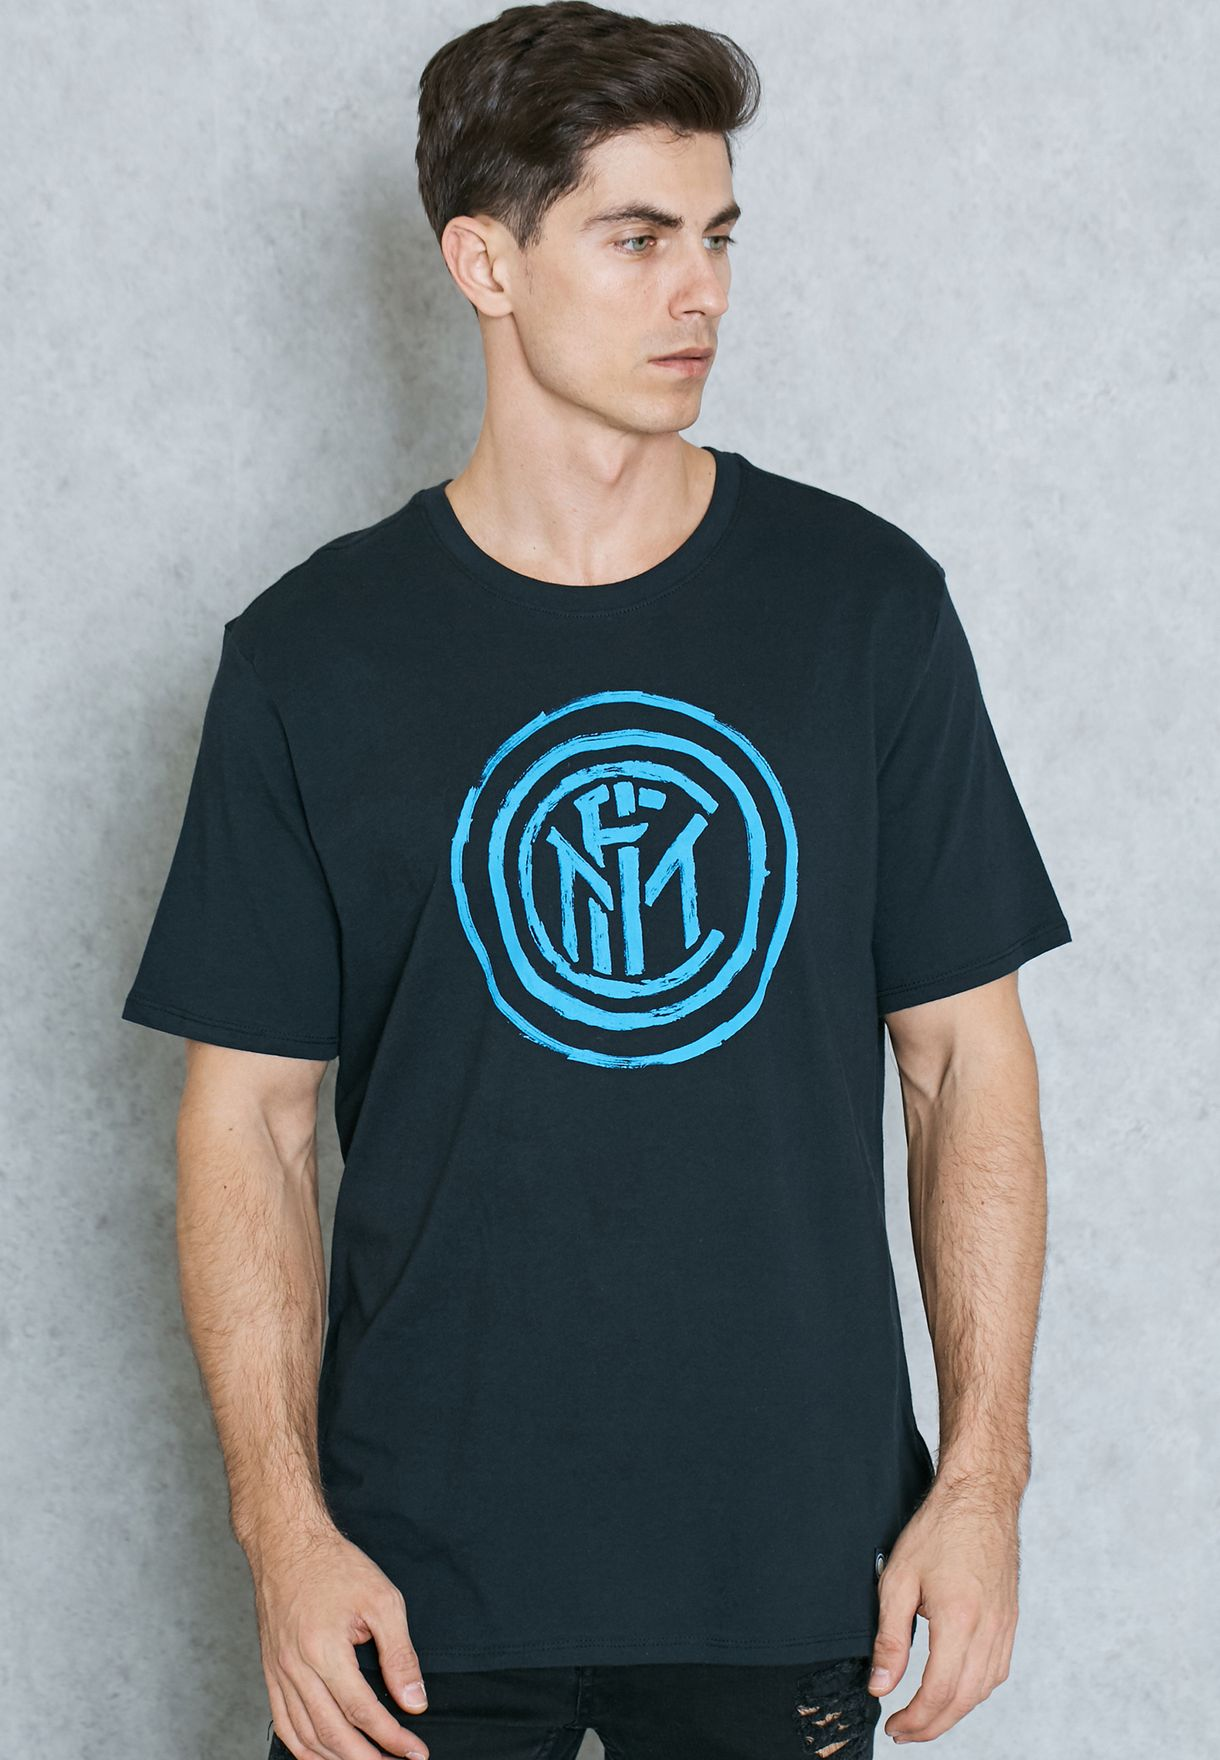 Men In Milan T Shop 805743 Uae Nike Inter Shirt Crest 011 For Black tqtfwvxP